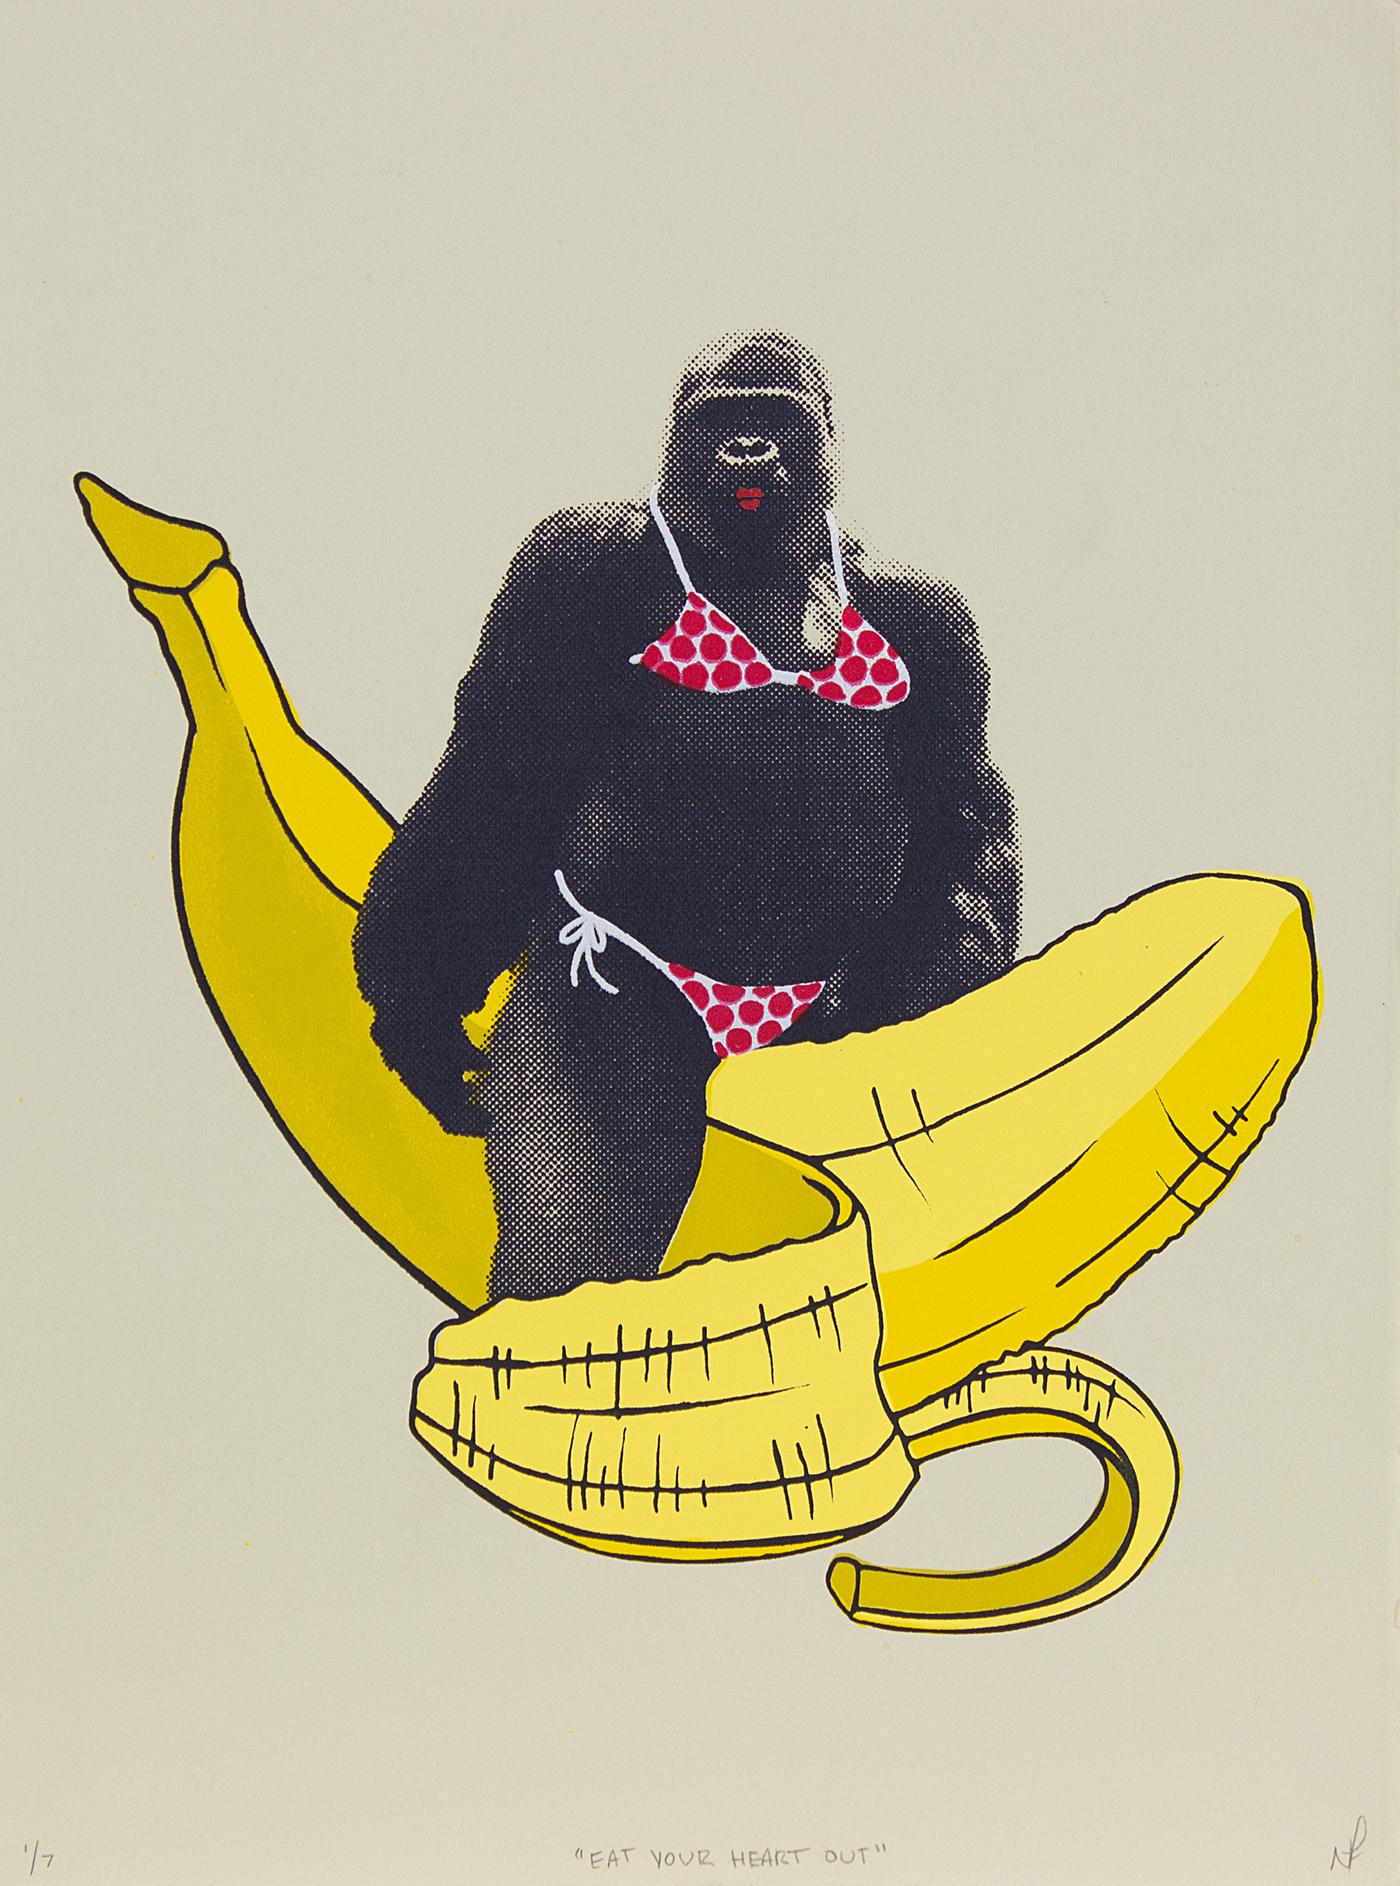 Goriila sexy bikini banana body image animal personal self portrait